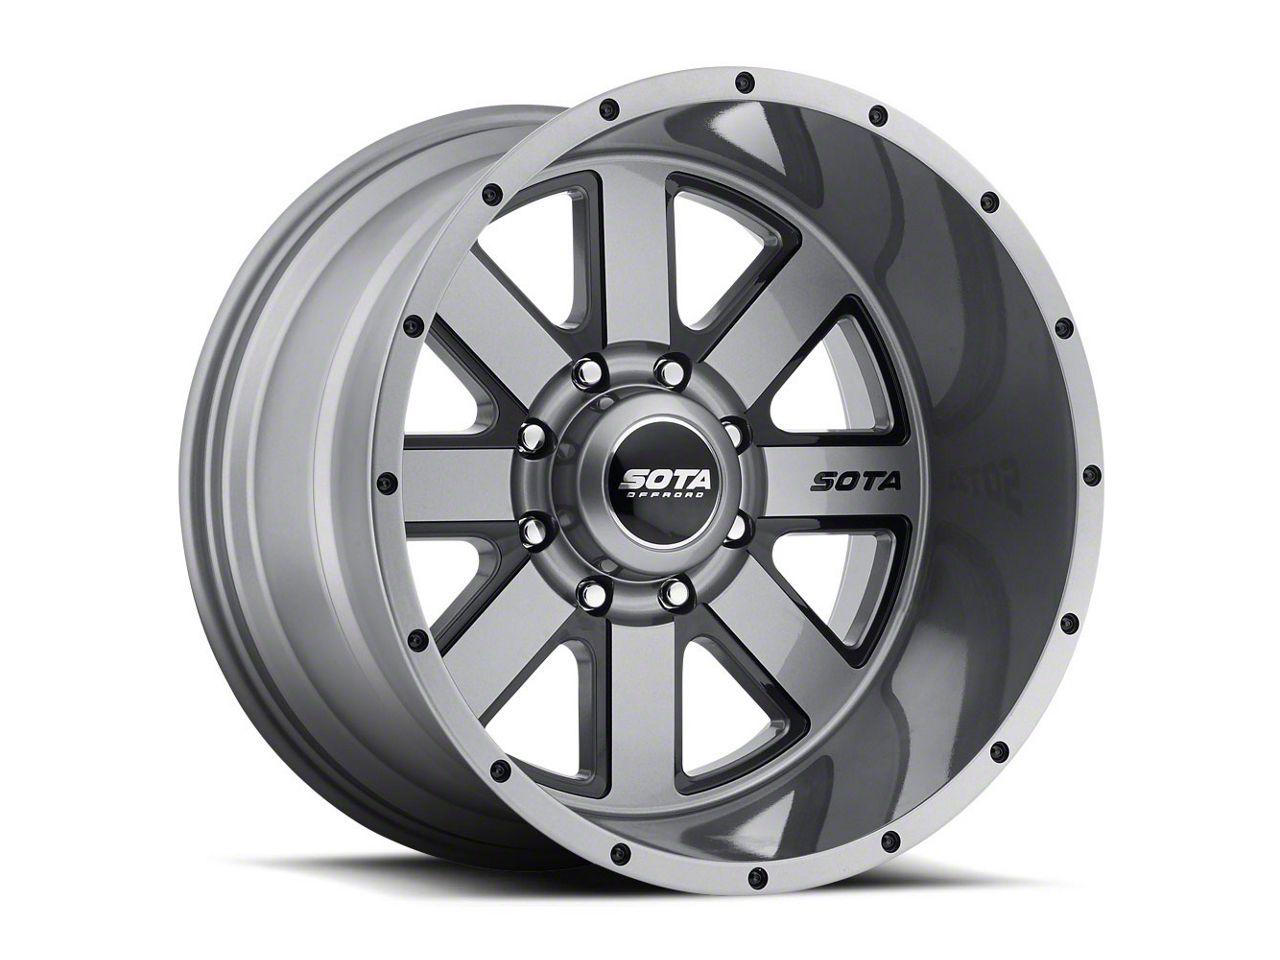 SOTA Off Road A.W.O.L. Anthra-Kote Black 8-Lug Wheel - 20x12 (06-08 RAM 1500 Mega Cab)